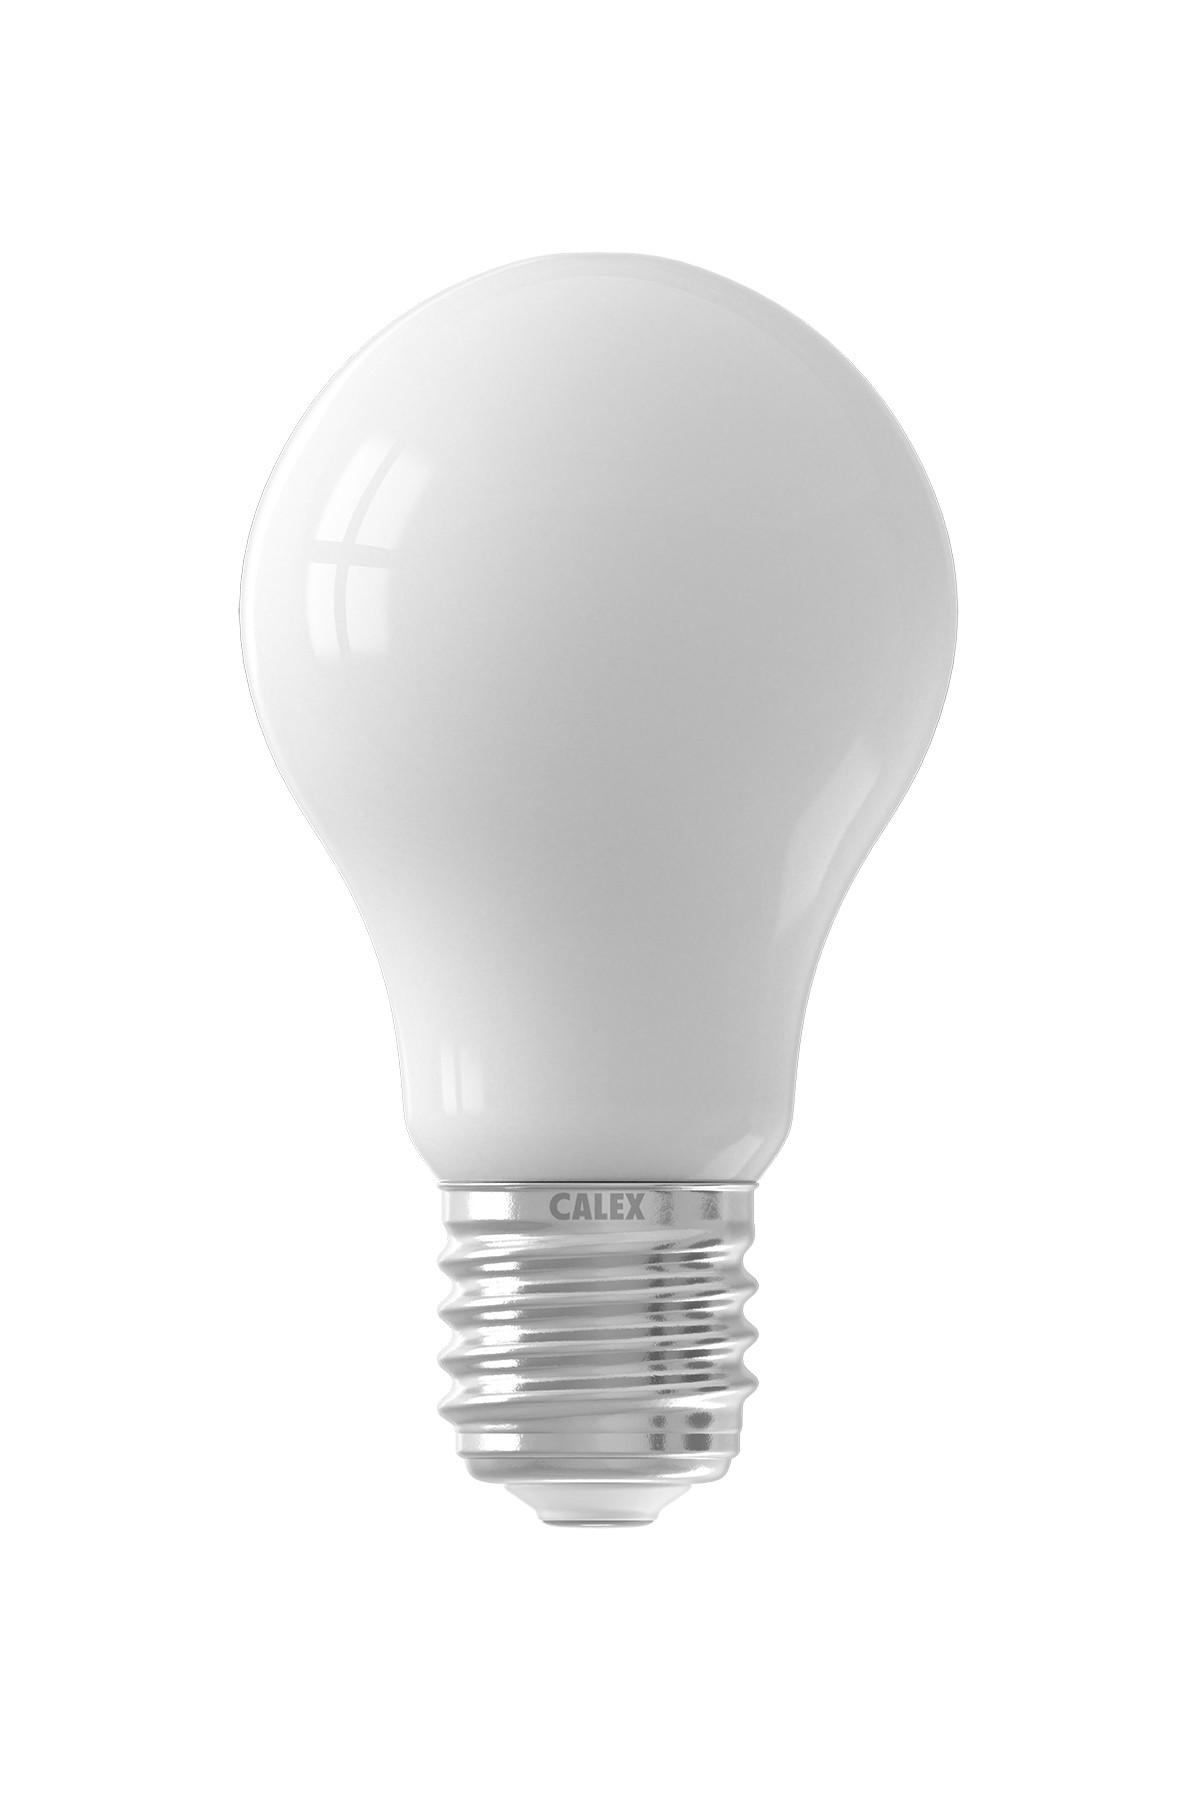 Calex LED volglas Filament Standaardlamp  220-240V 7W 810lm E27 A60, Softline 2700K CRI80 Dimbaar